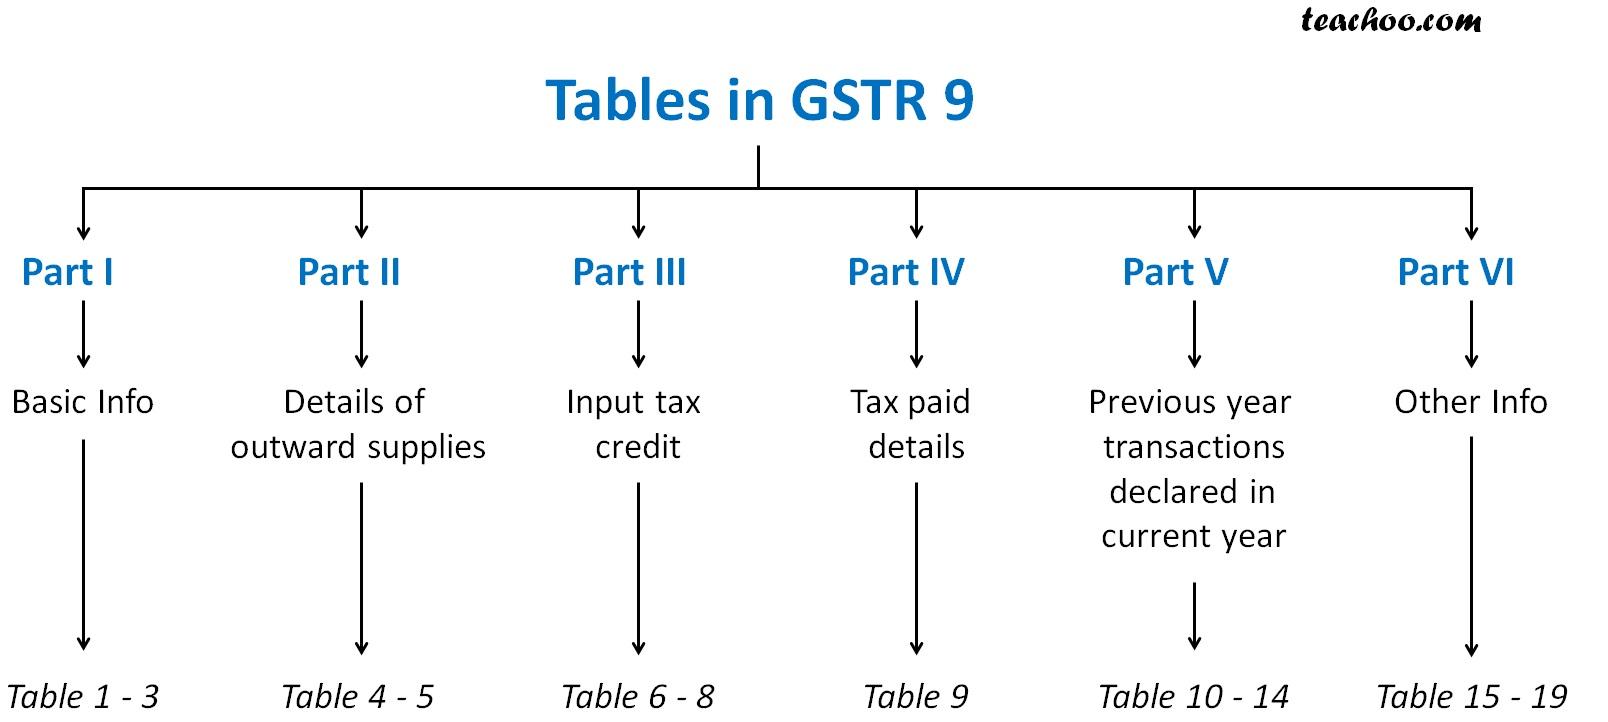 Tables in GSTR 9.jpg